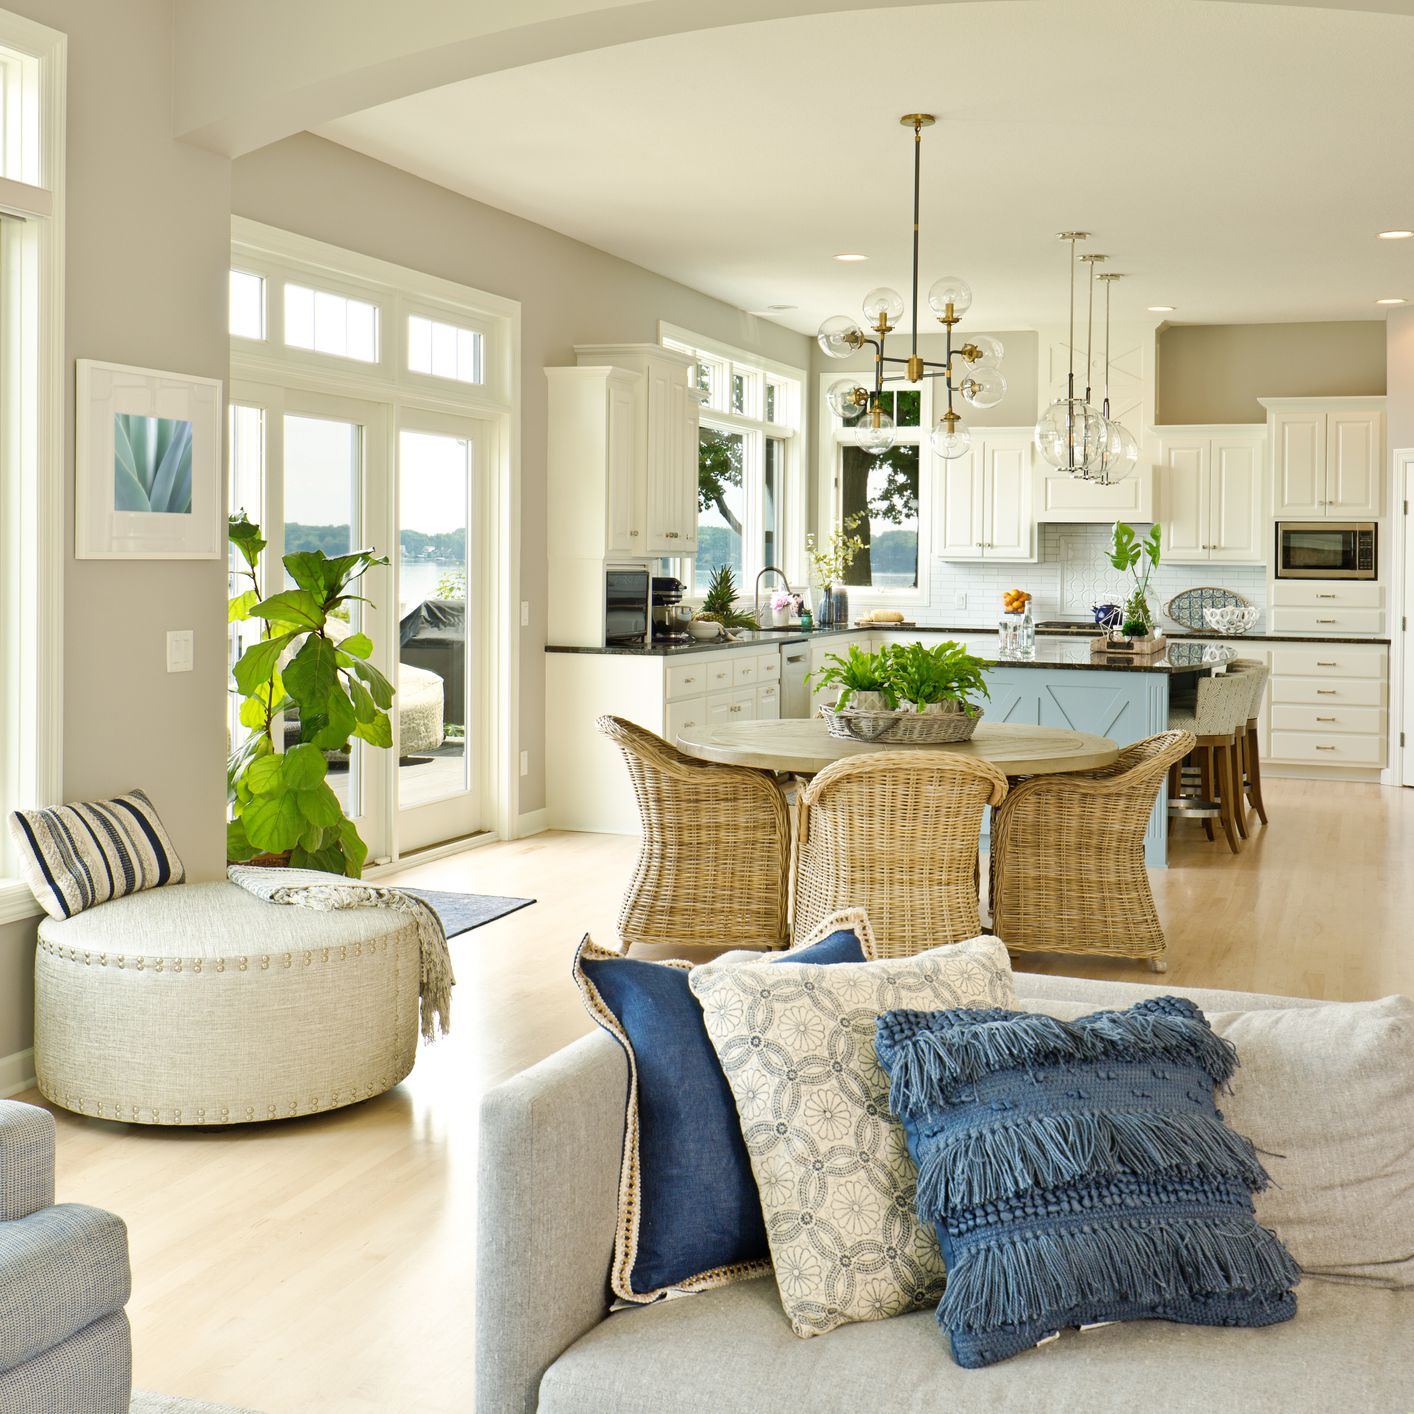 decorative kitchen decor.htm decorating rooms so they work together  decorating rooms so they work together